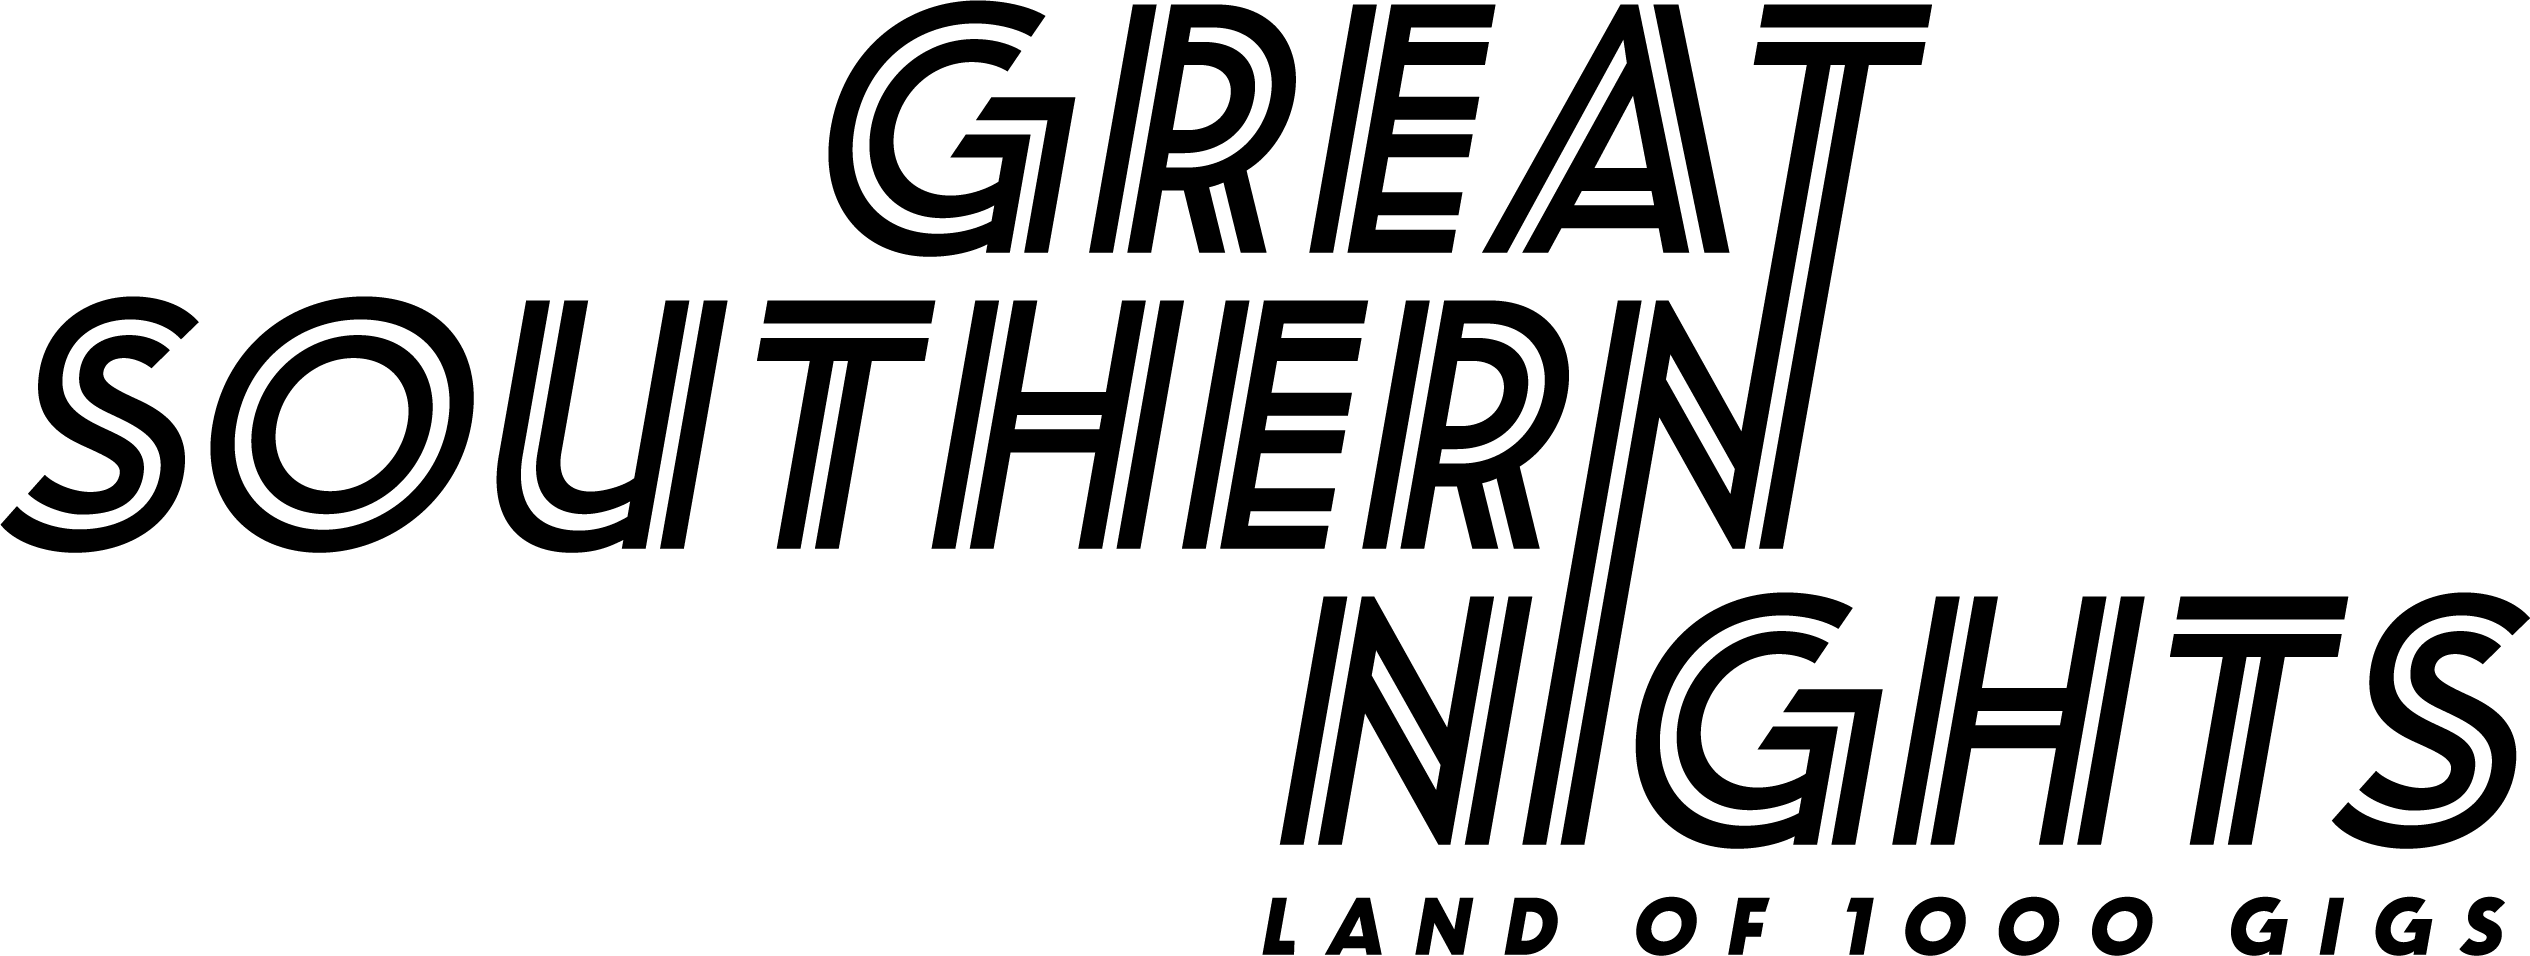 Great Southern Nights logo